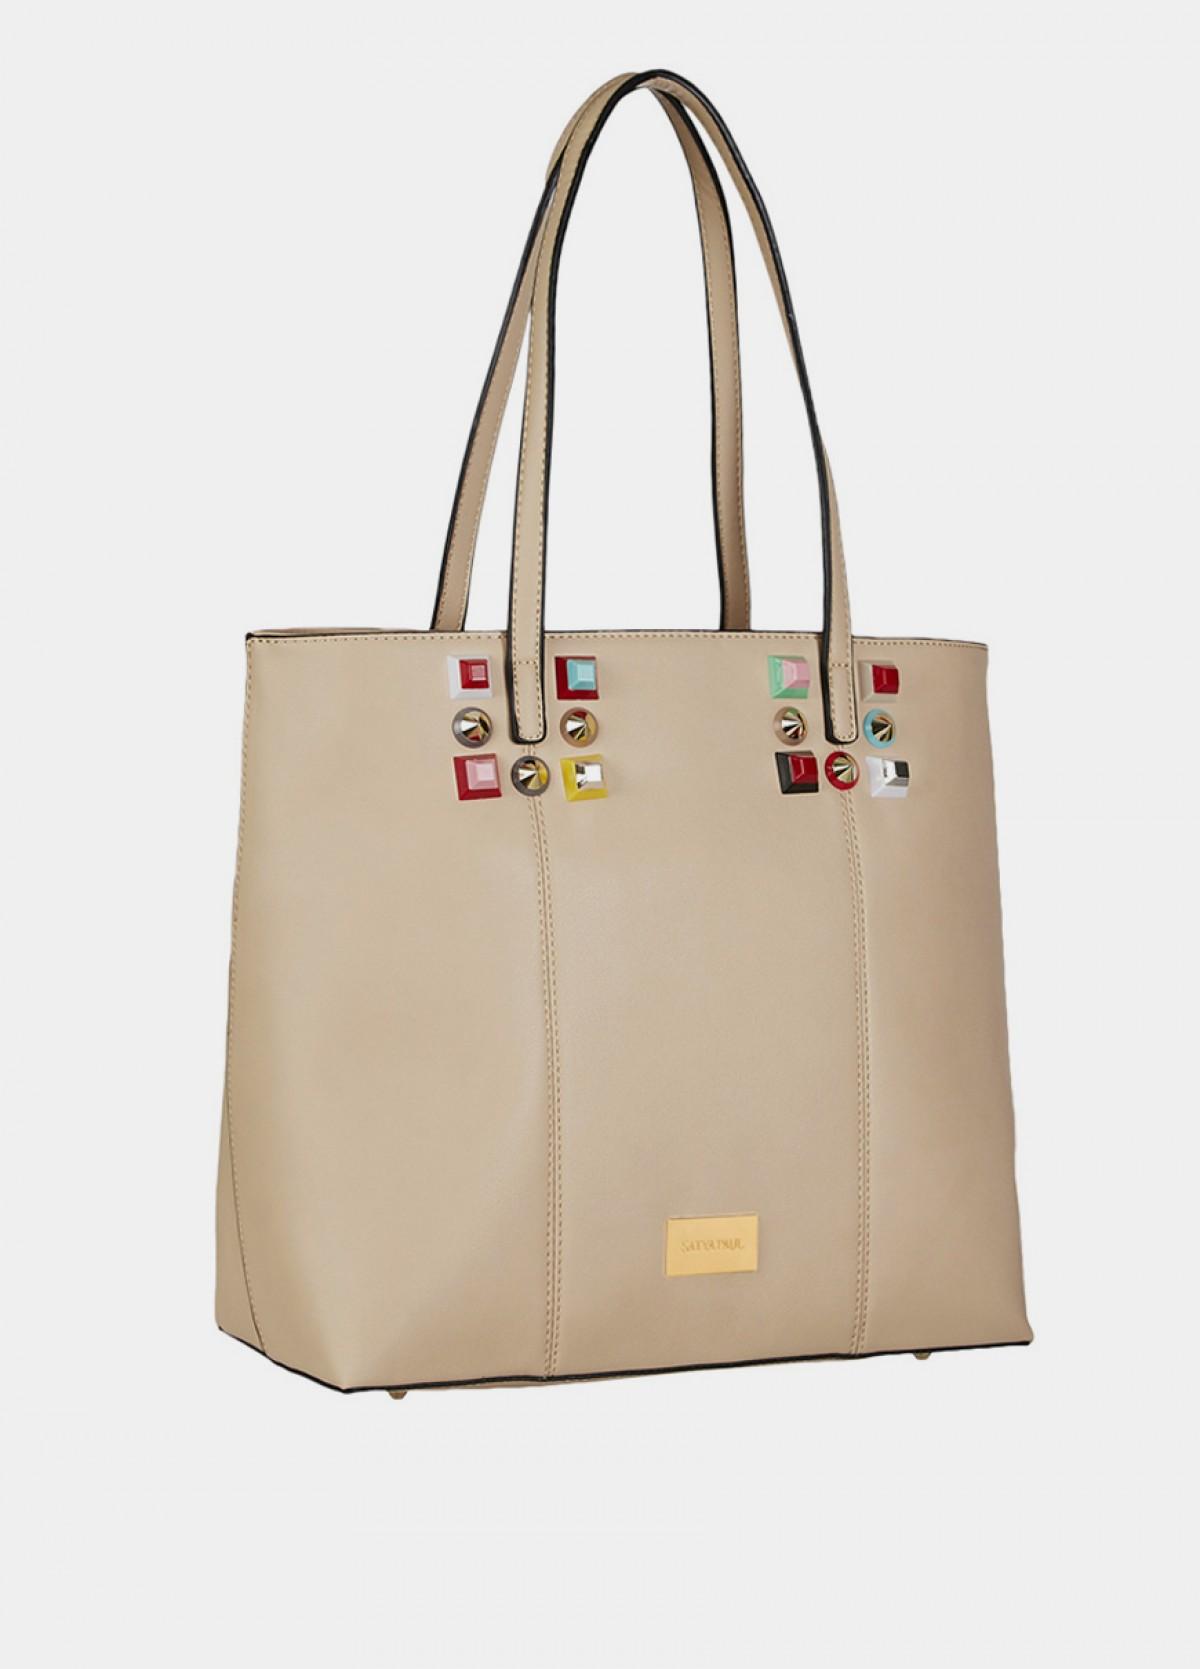 The Beige Tote Bag